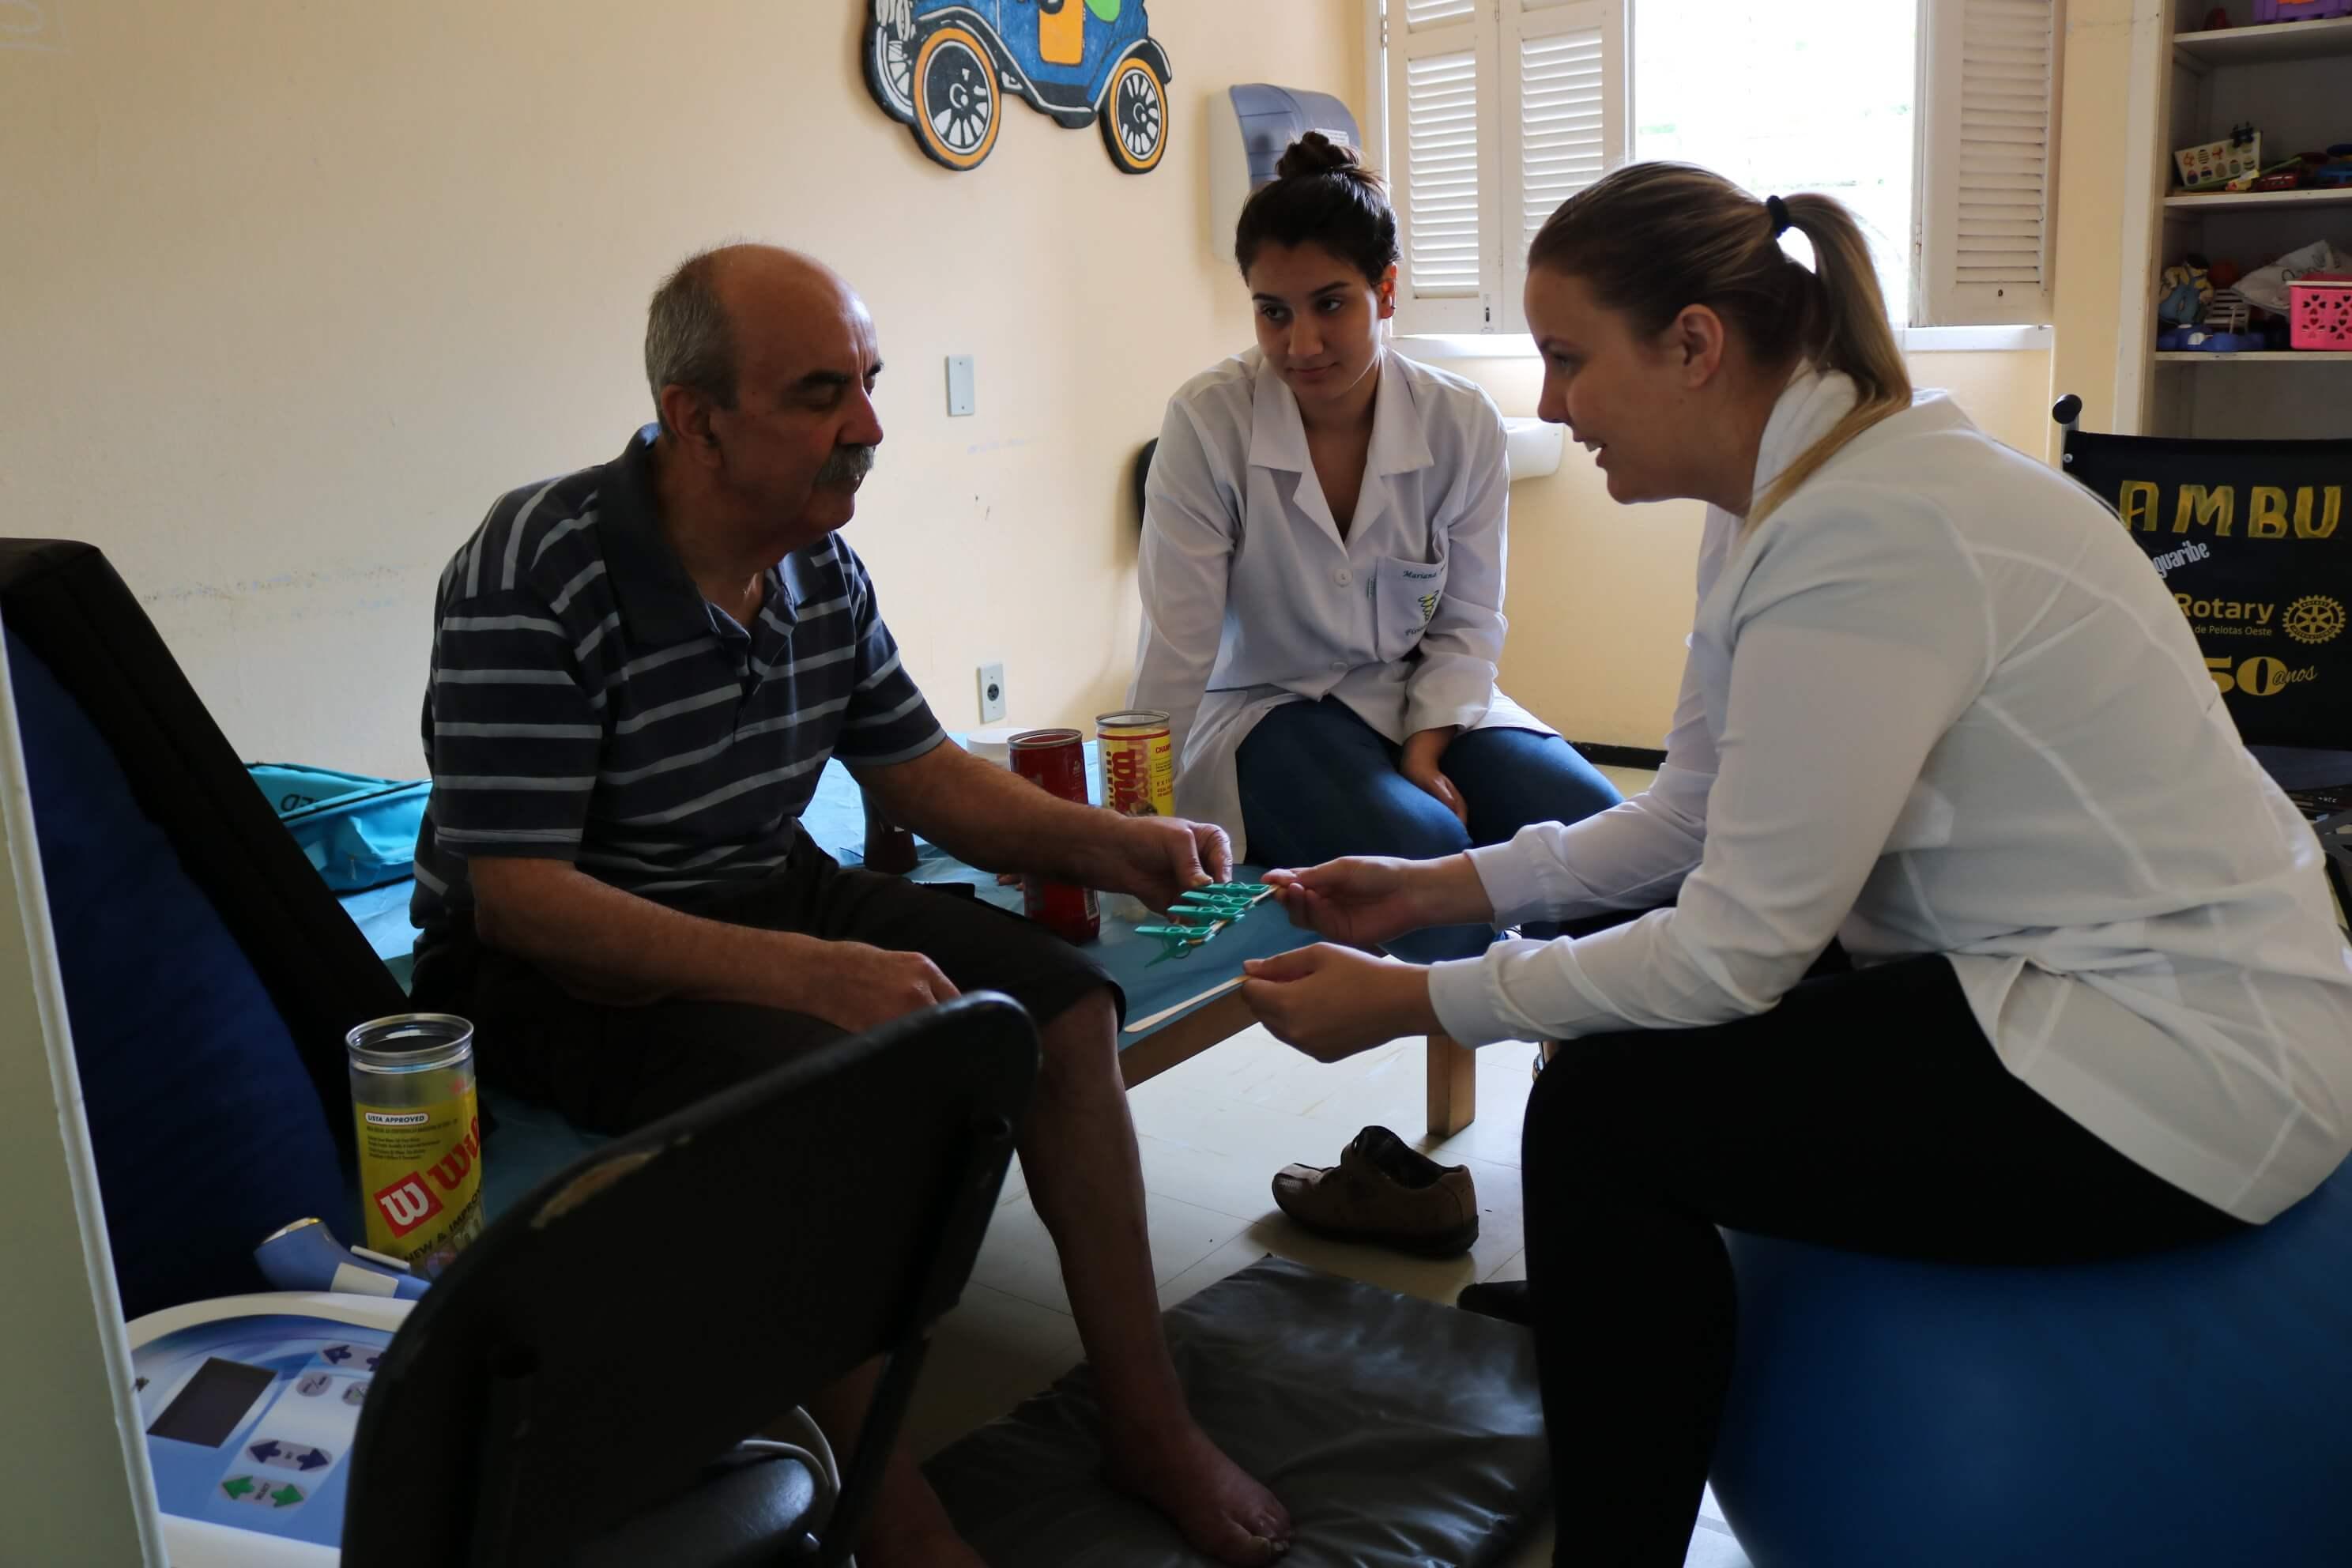 fisioterapia-na-ucpel_1